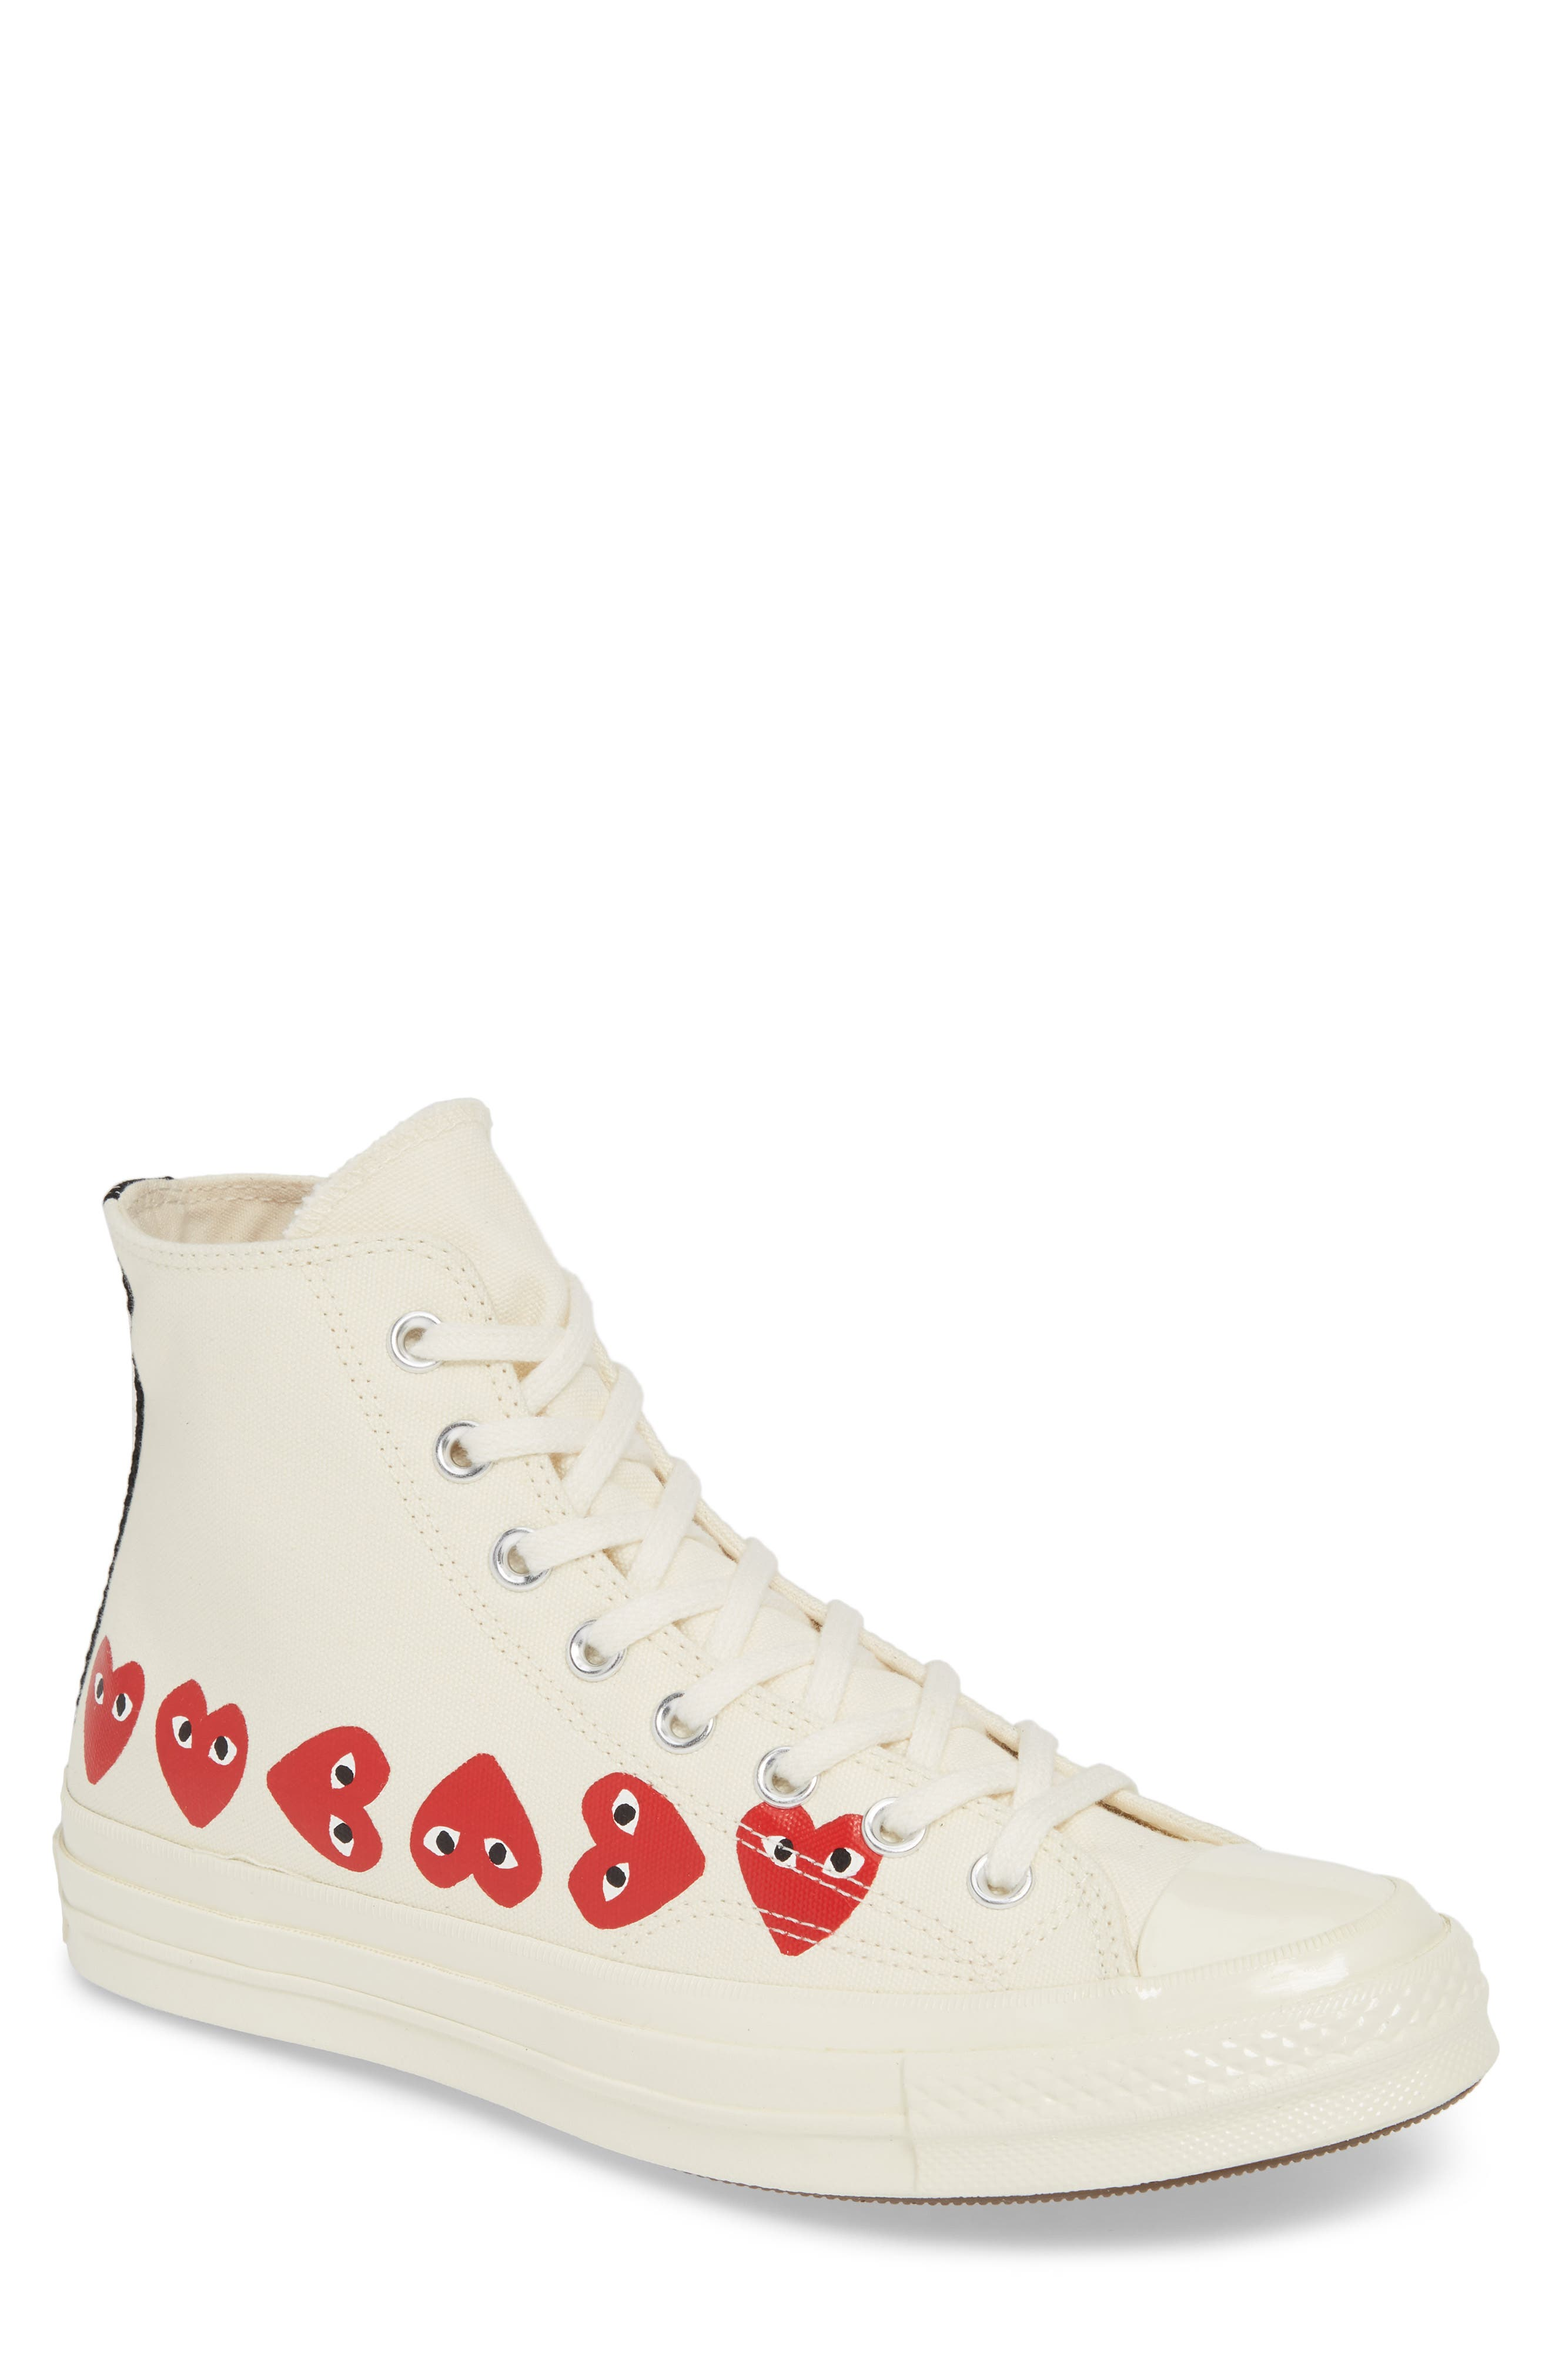 COMME DES GARÇONS PLAY Multiheart Sneaker, Main, color, OFF WHITE